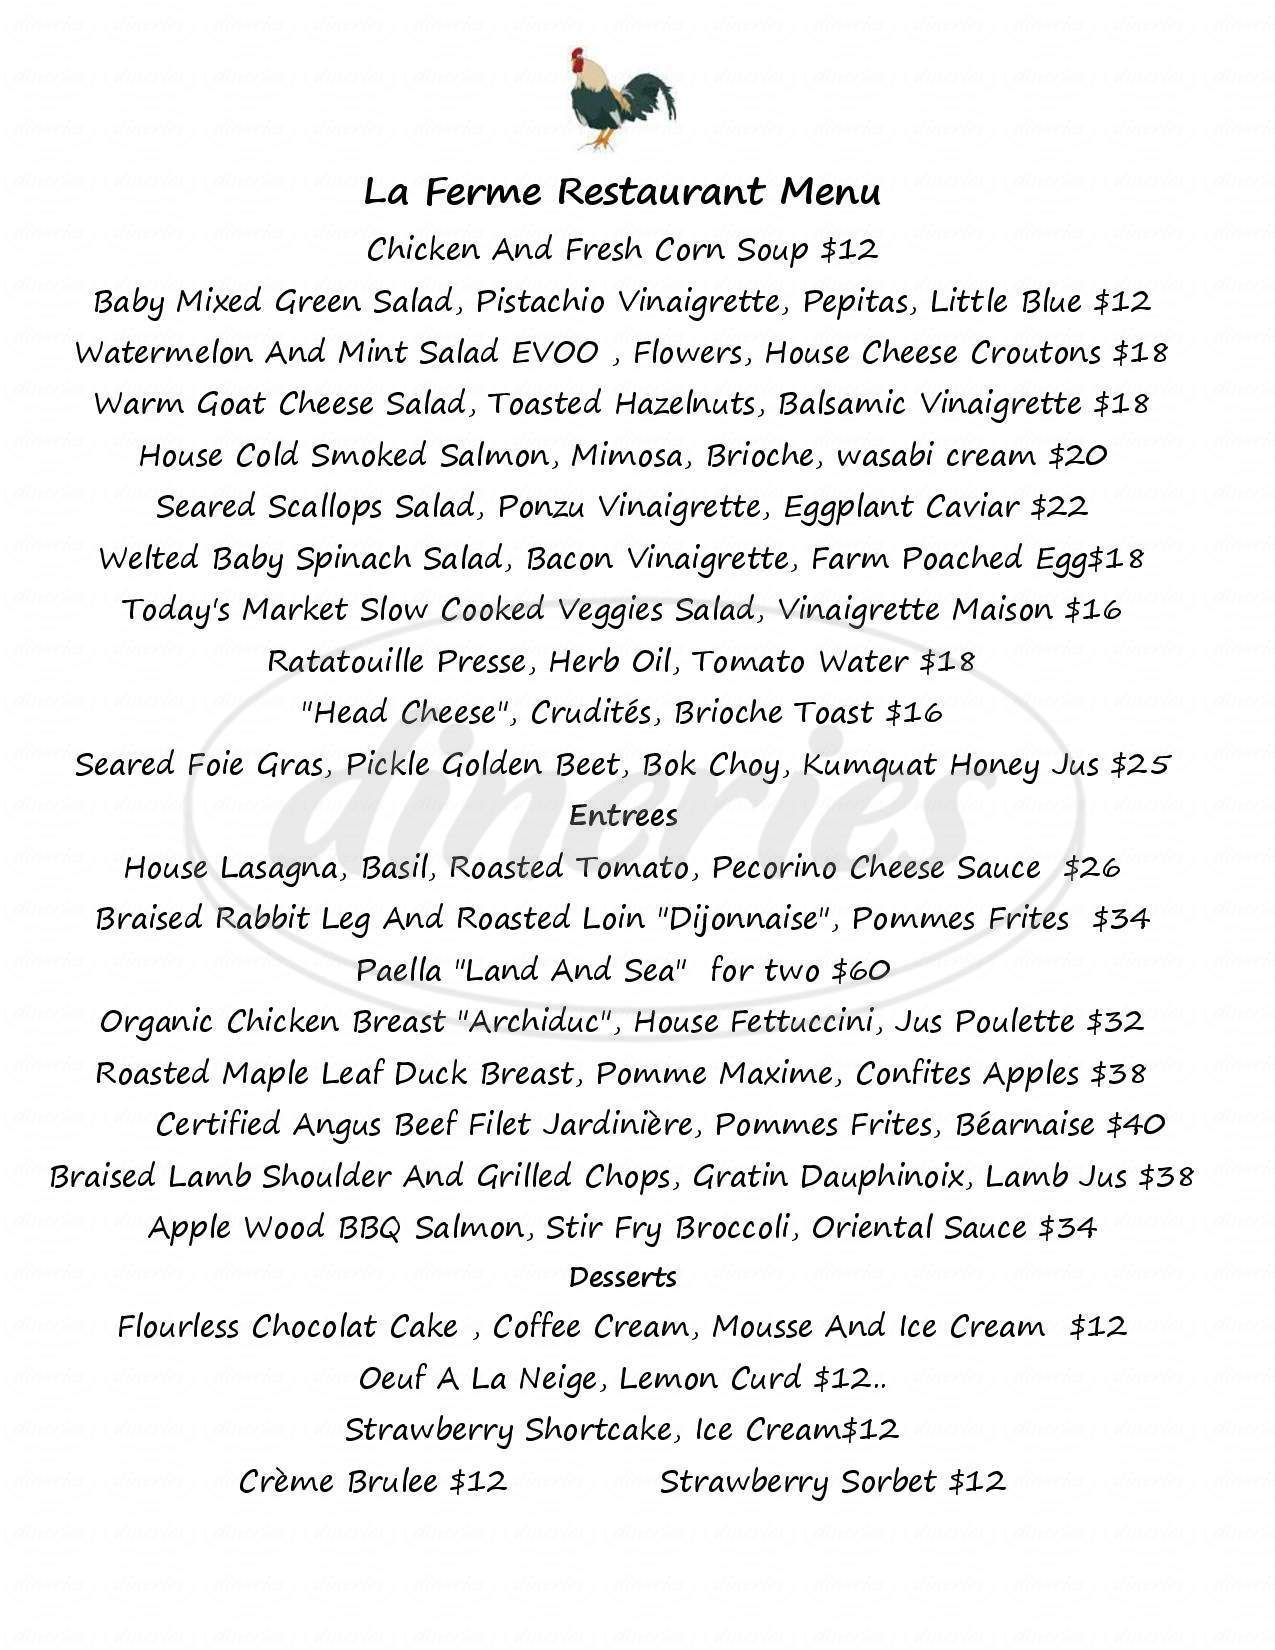 menu for La Ferme